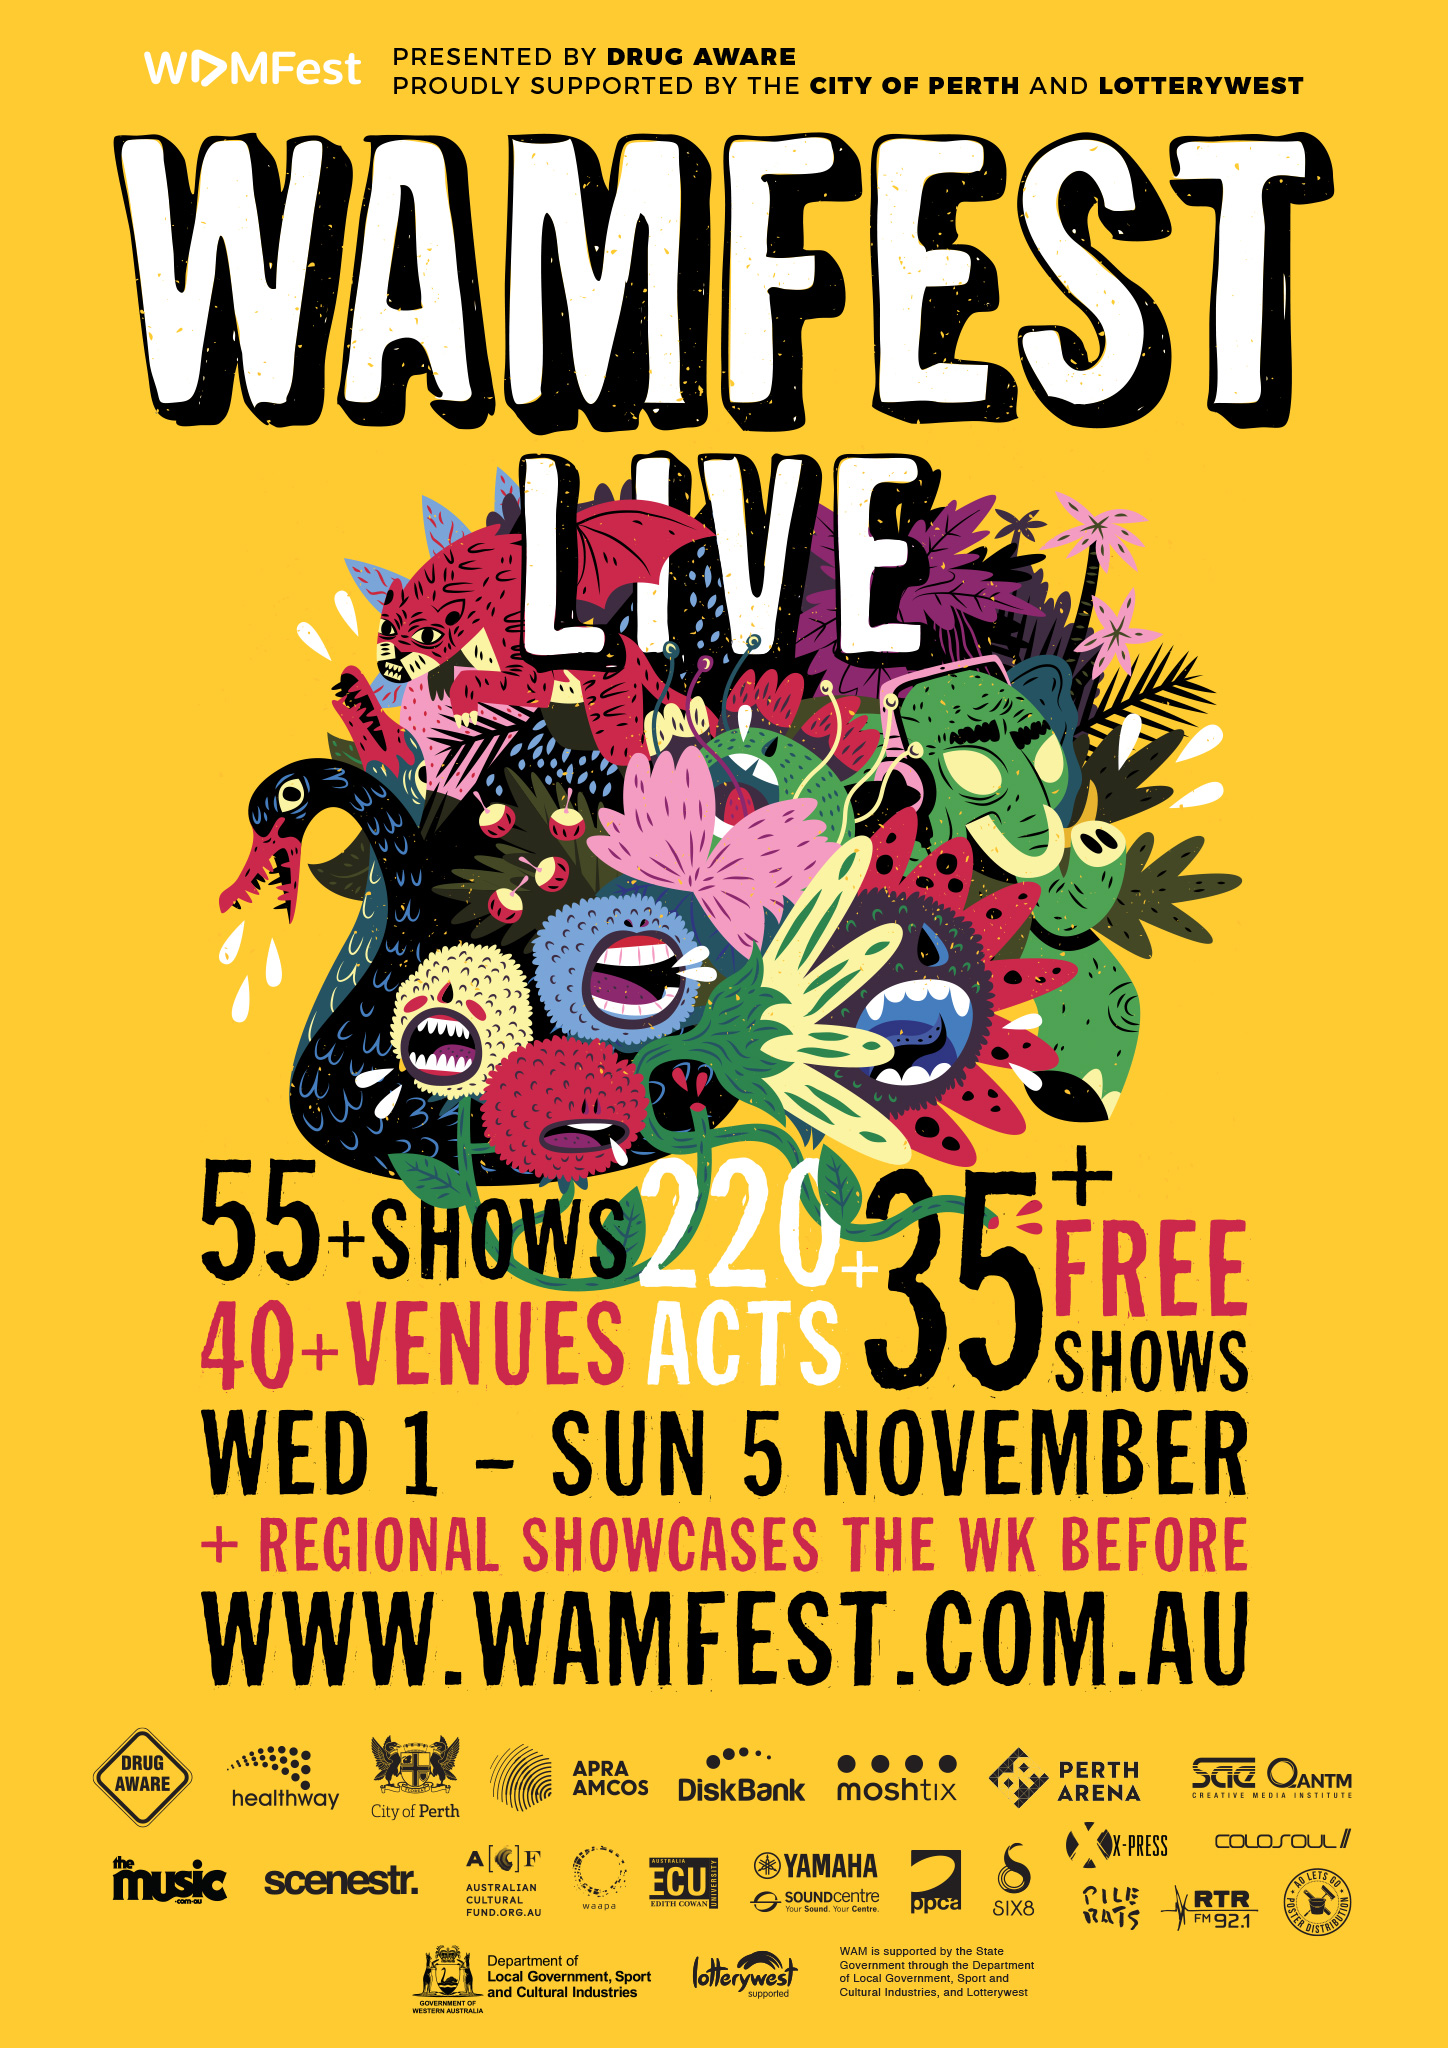 WAM2017-posters-A3-1.jpg